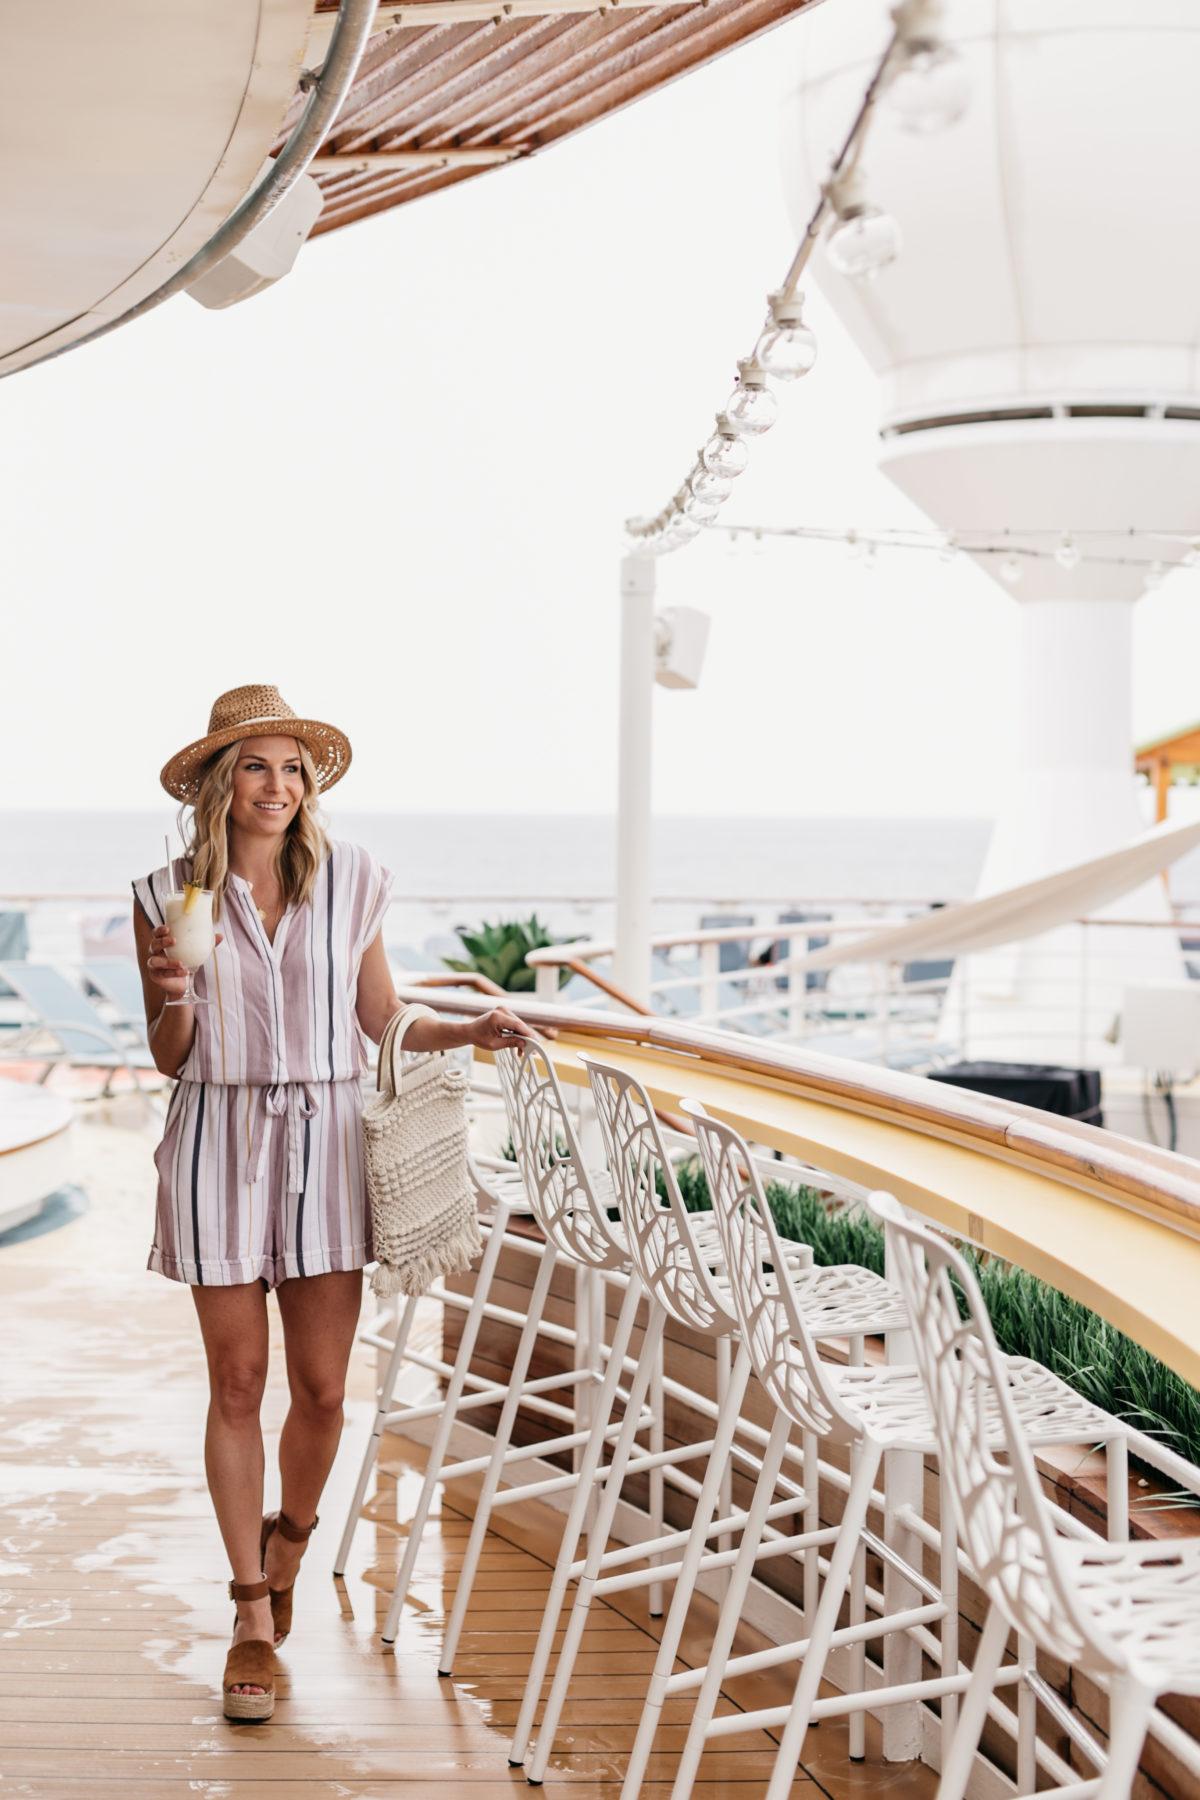 ROYAL CARIBBEAN CRUISE & A Cruise Outfit: Striped Romper // Straw Hat // Tan Espradrilles // Macrame Bag